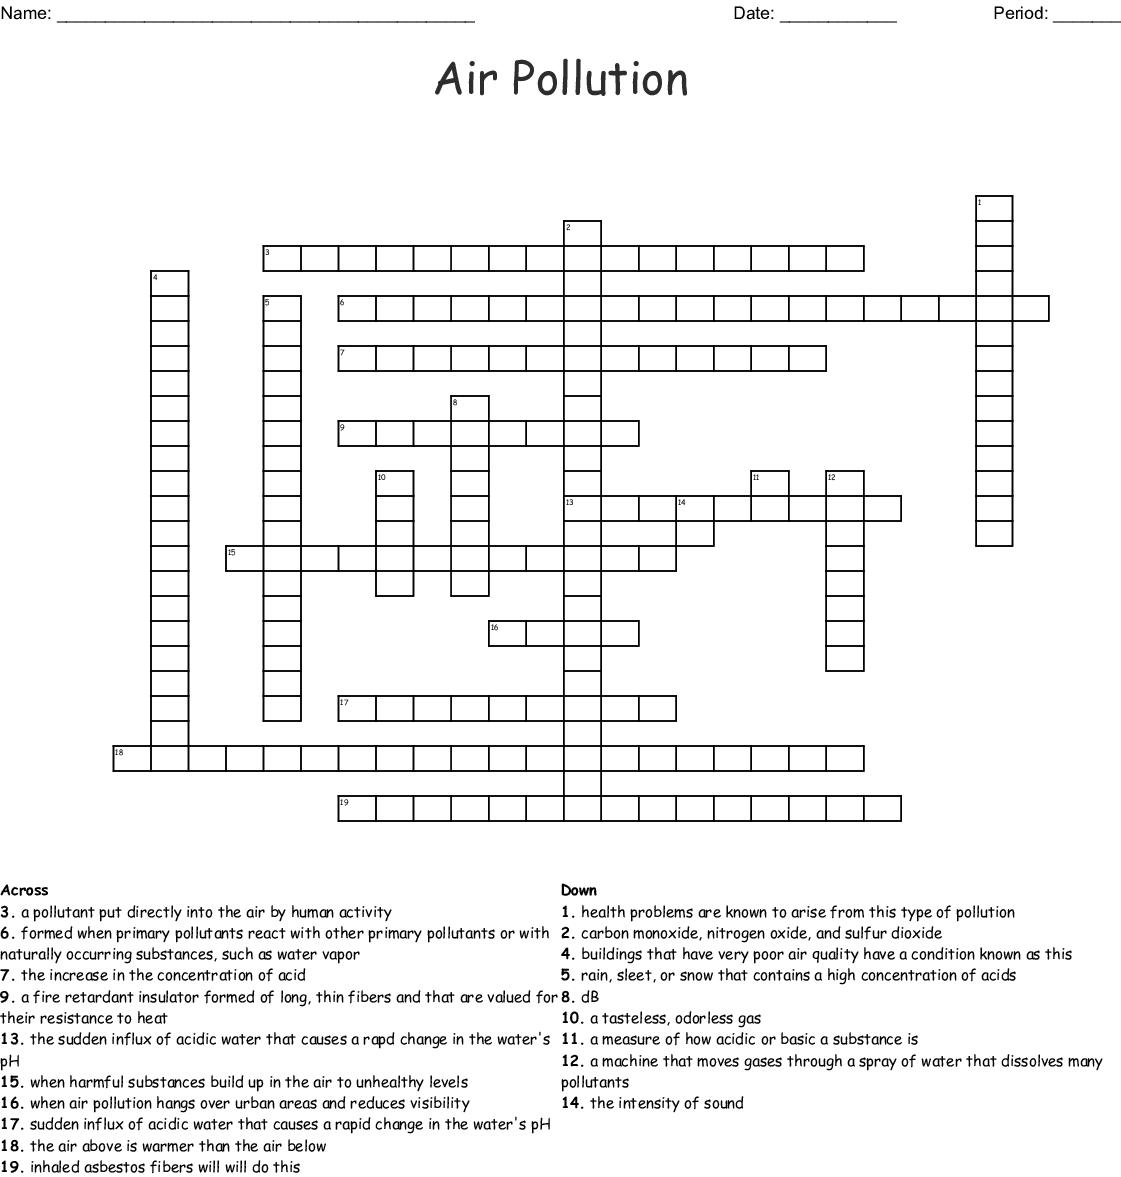 Atmospheric Pollution Crossword